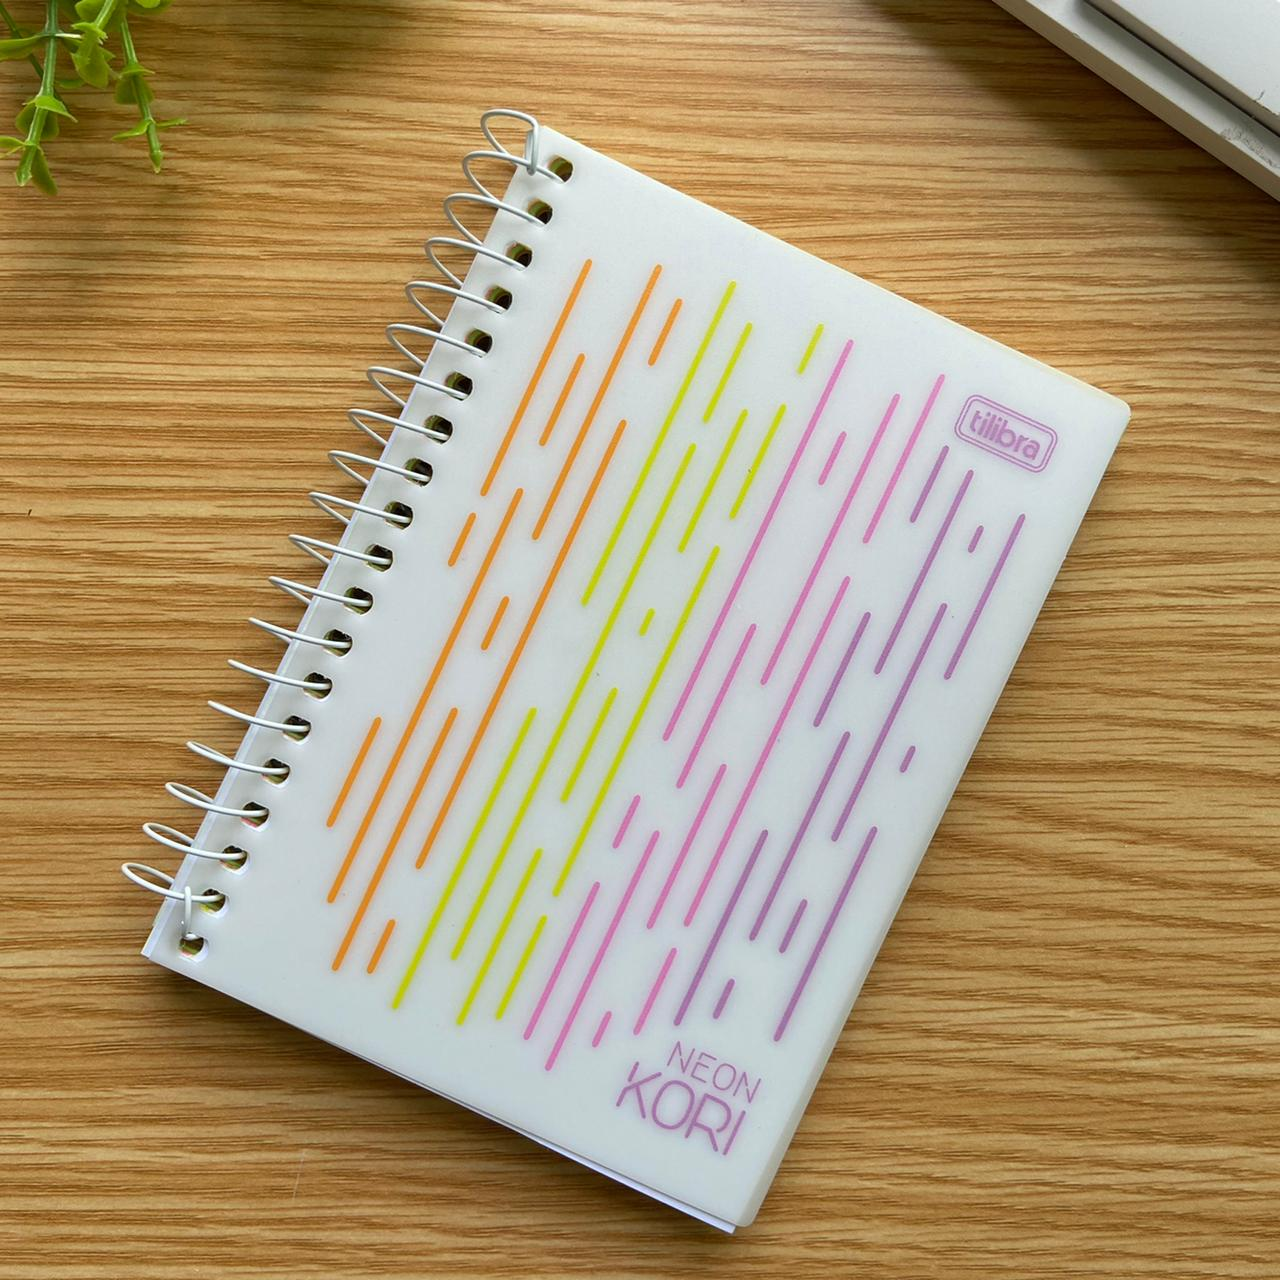 Caderno Espiral 1/4 Neon Kori 80F | Tilibra